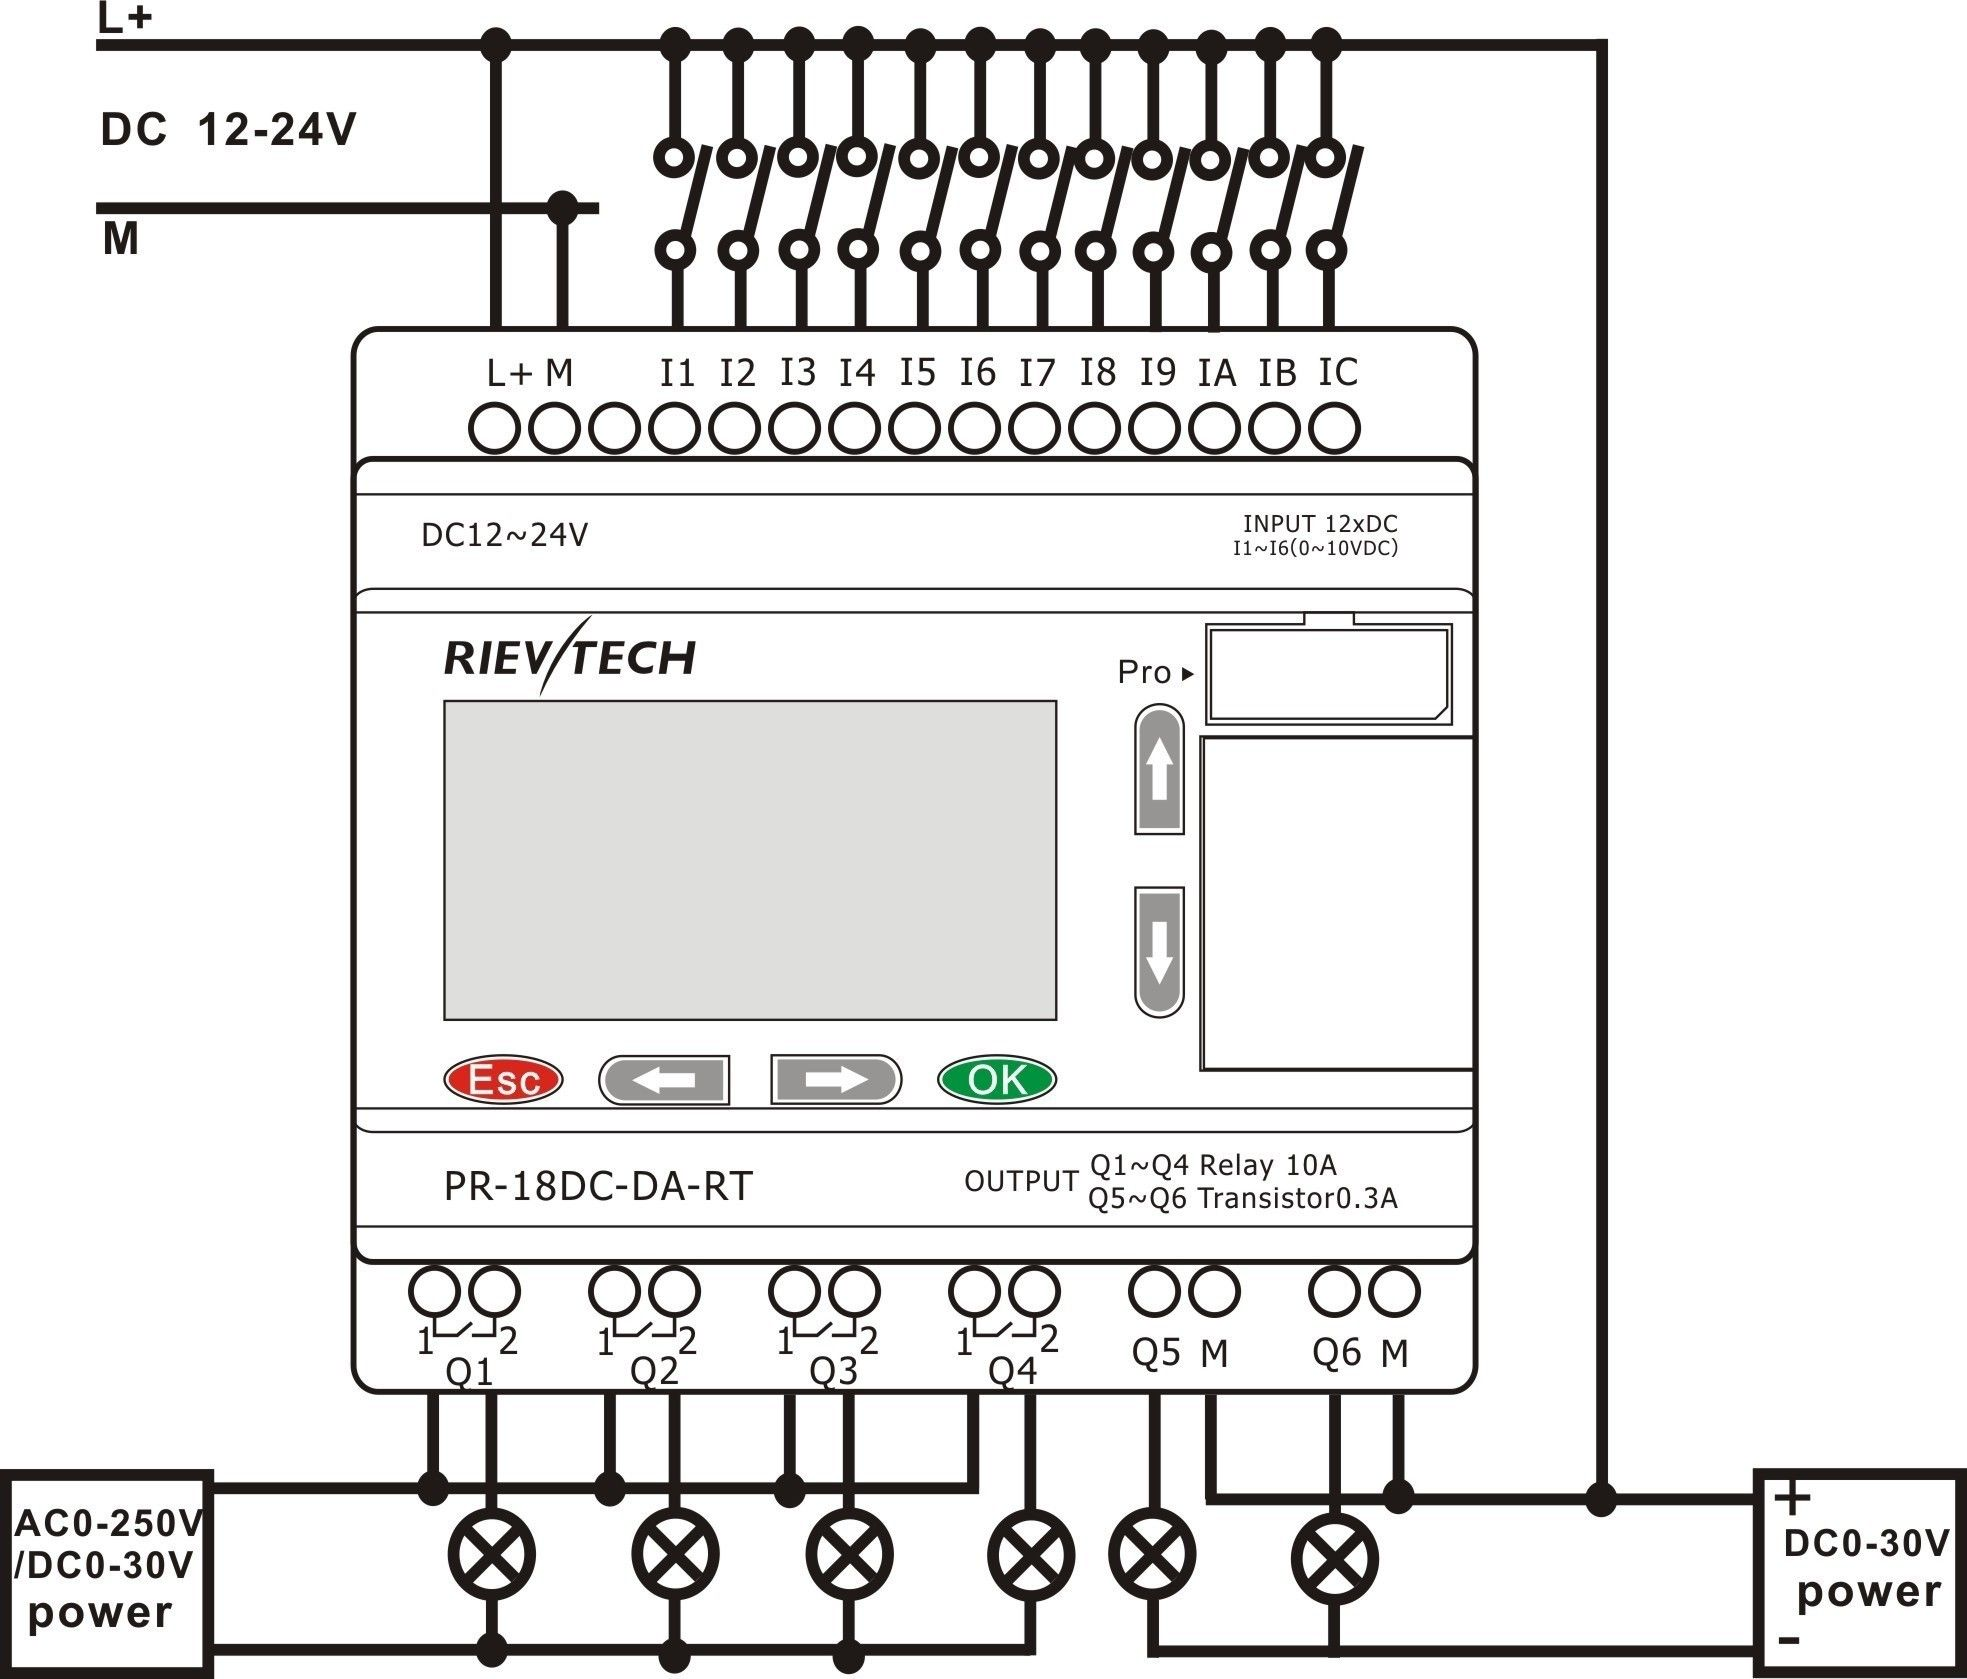 New Inverter Wiring Diagram Pdf Electrical Circuit Diagram Diagram Electricity